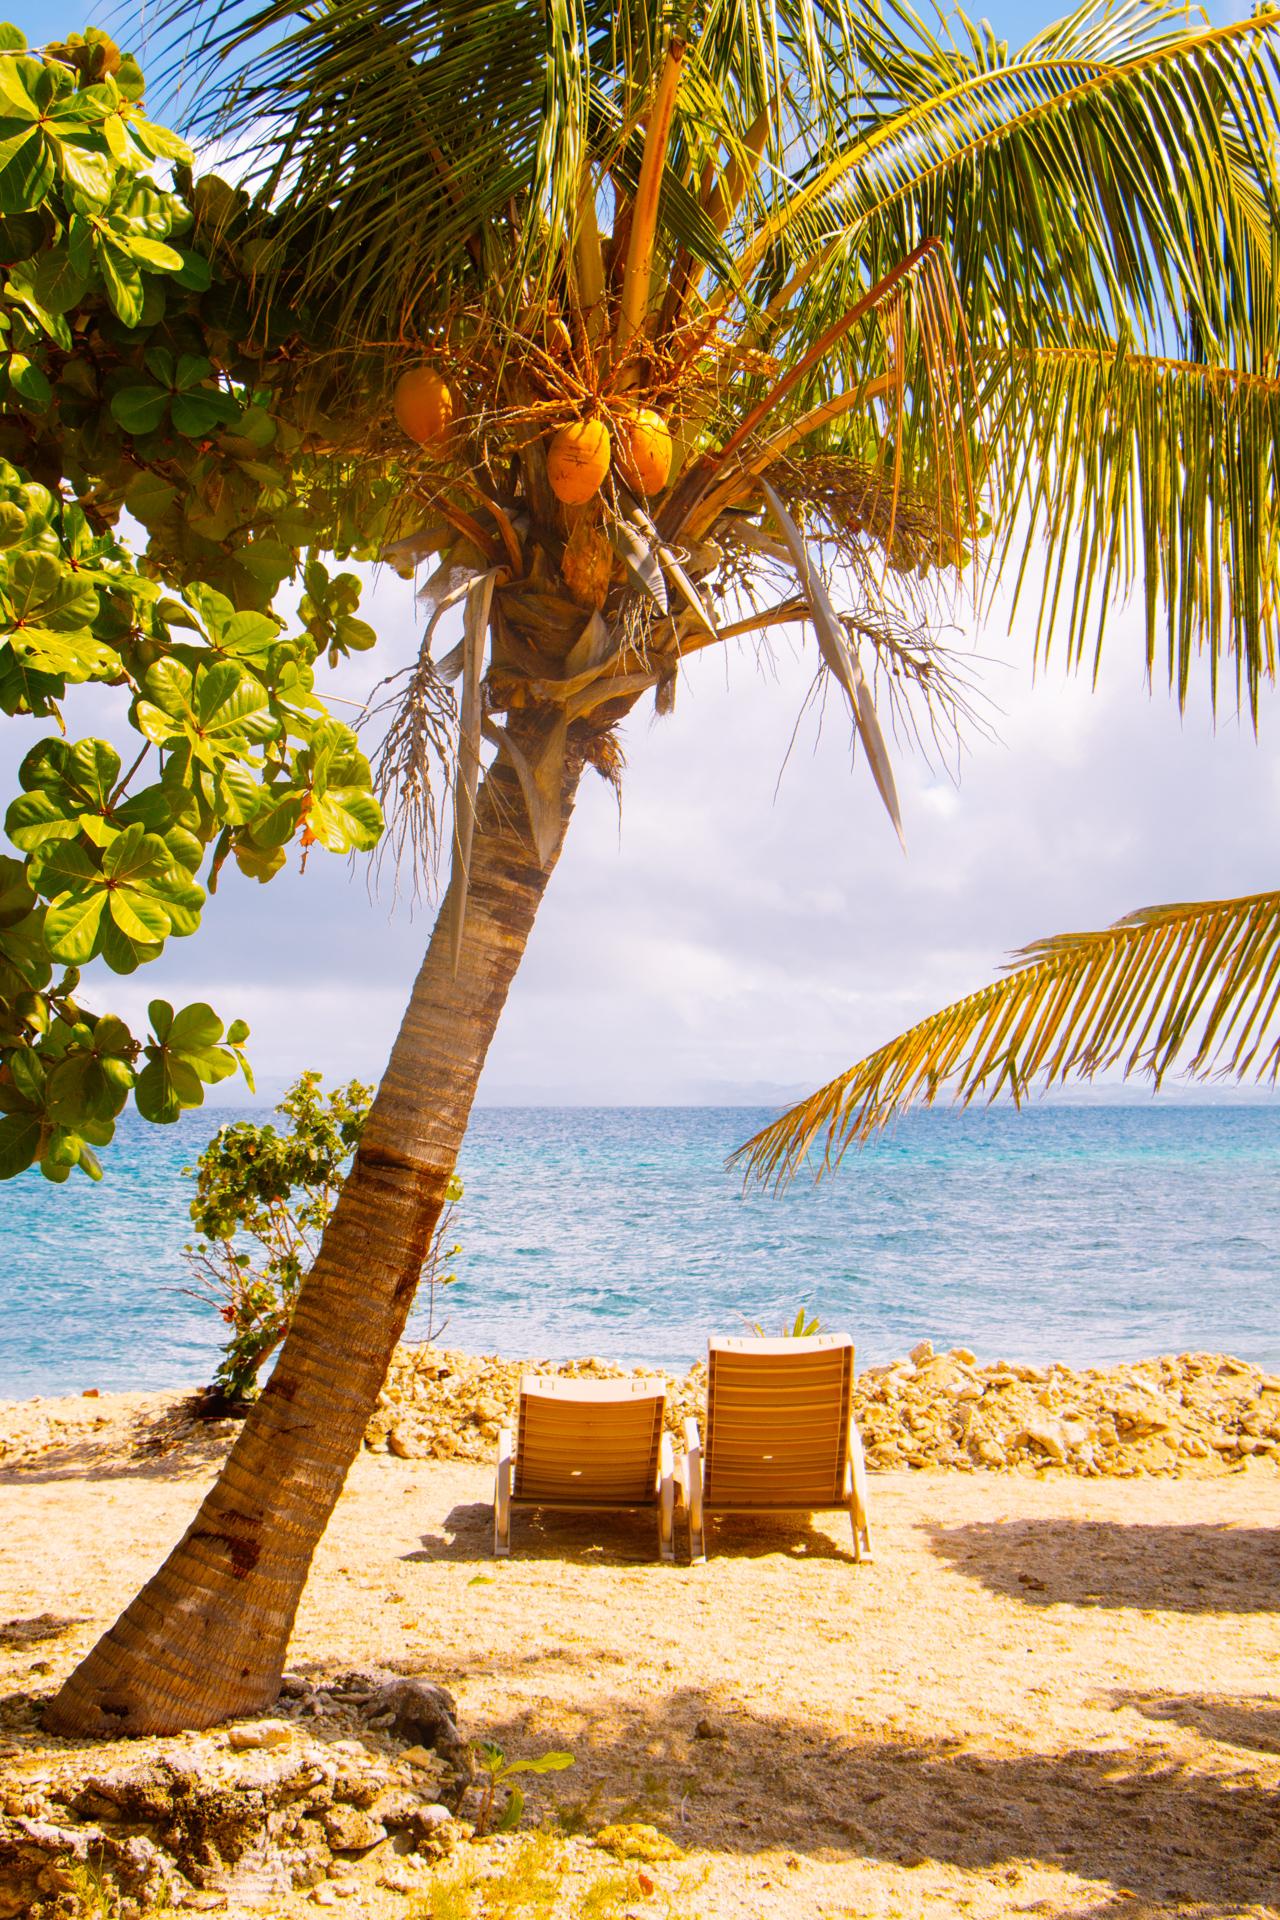 Coconut tree South Sea Island, Fiji